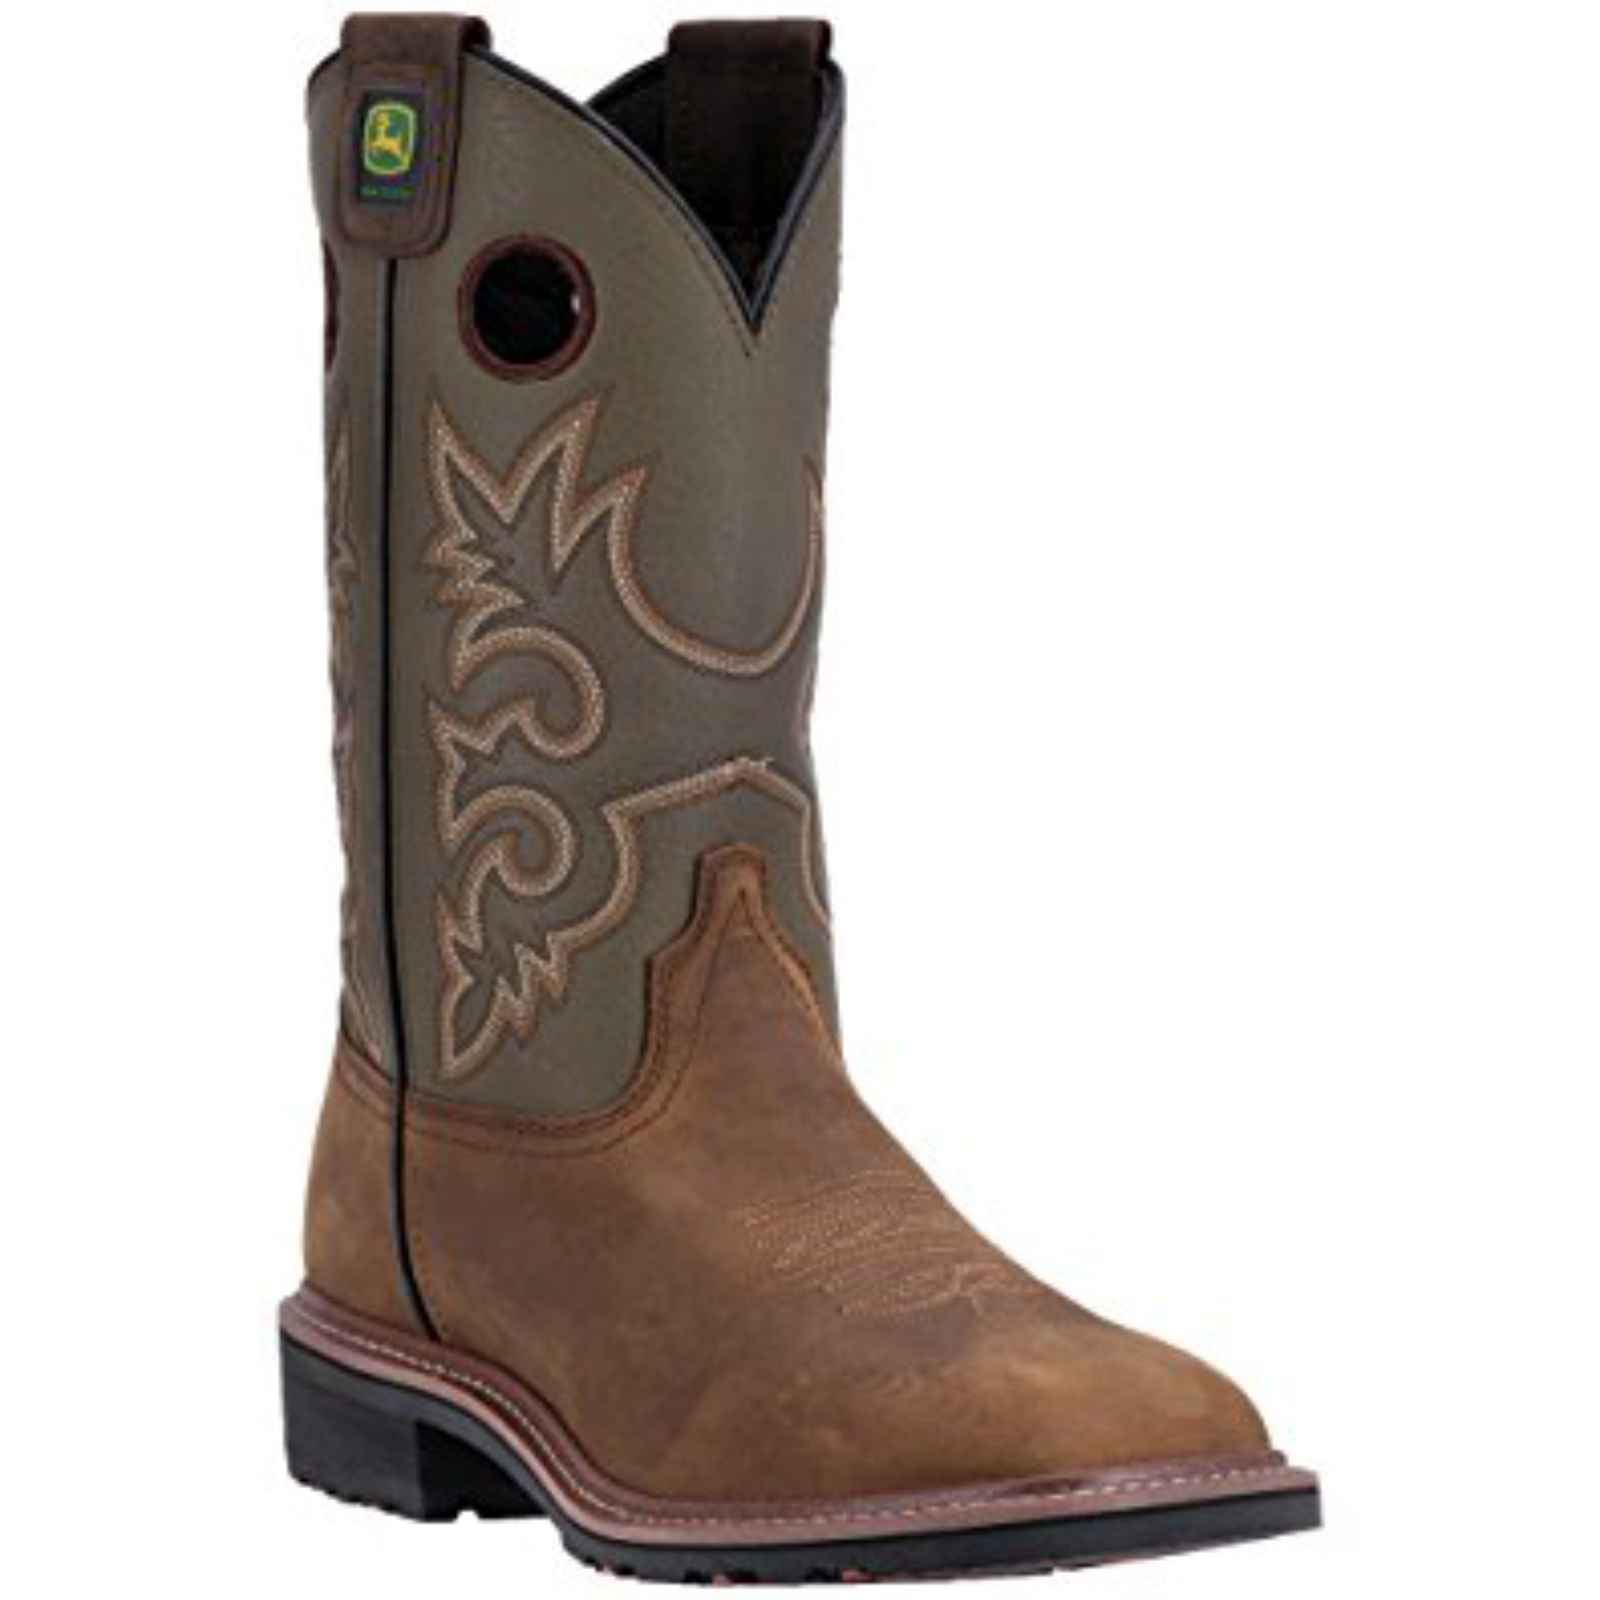 "John Deere Men's 11"" Brown Leather Pull-On Western Work Boots, JD4716 by John Deere"